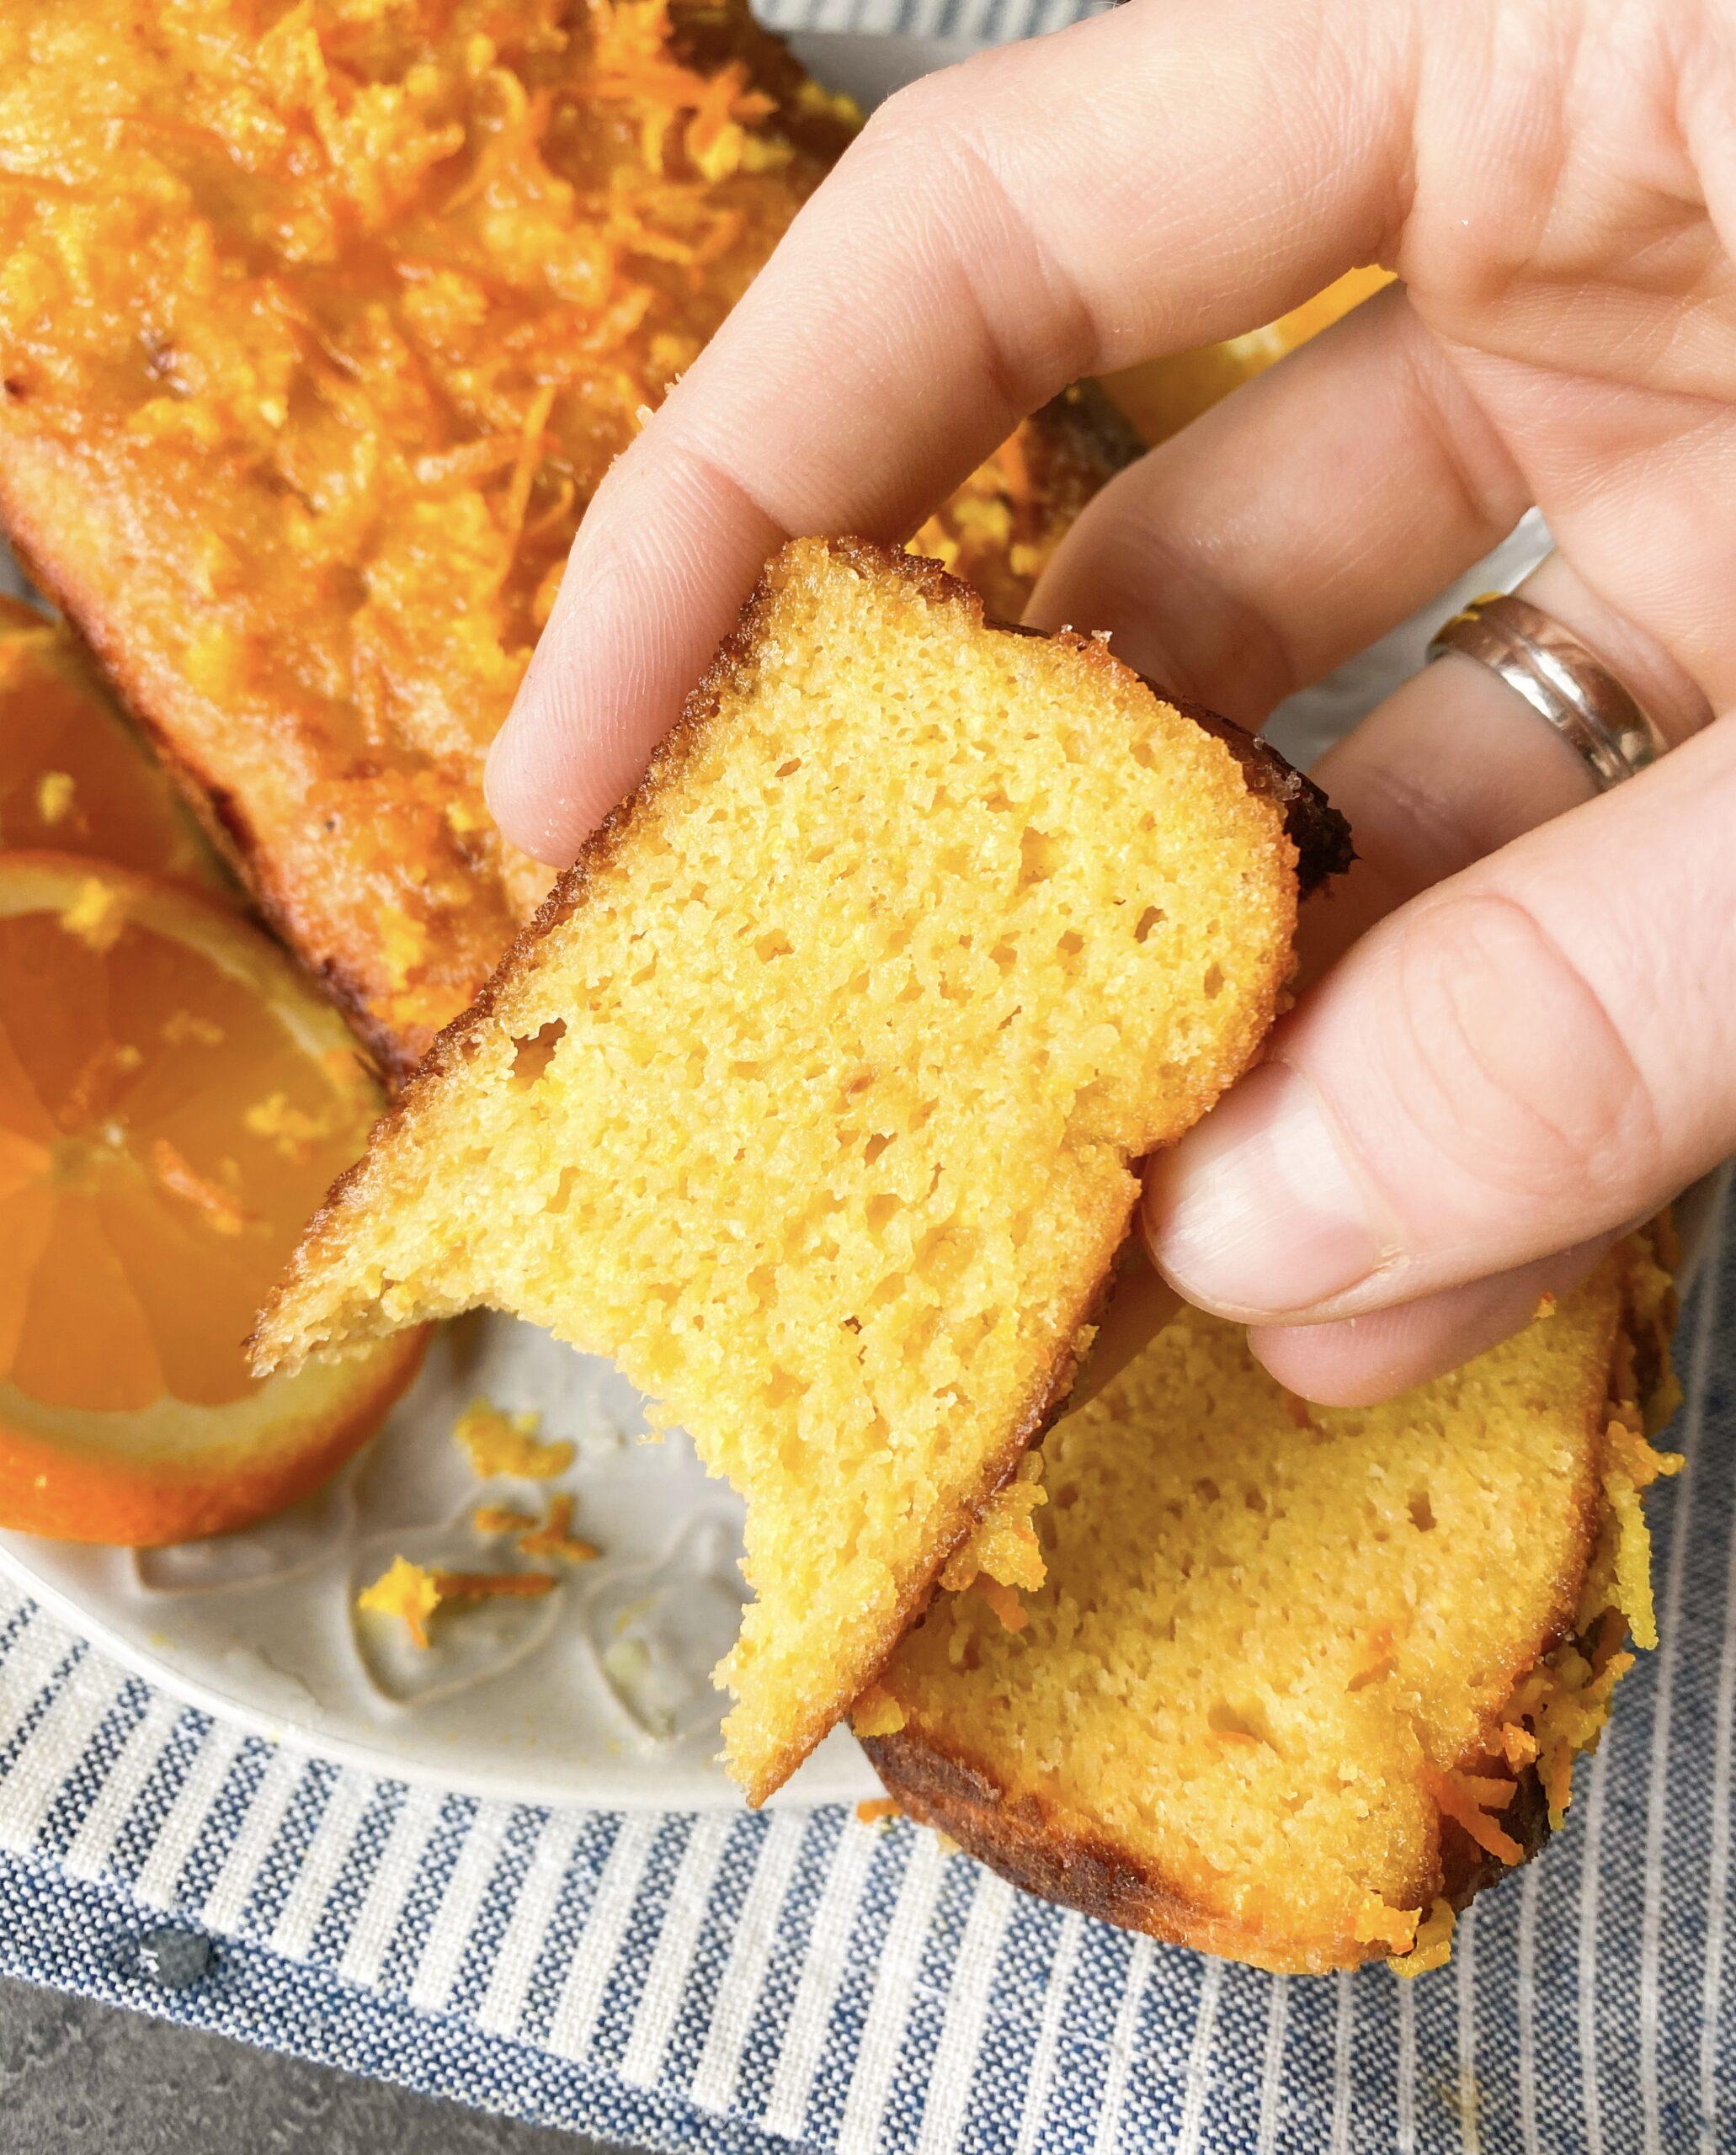 Picture of keto orange bread or diabetic orange cake